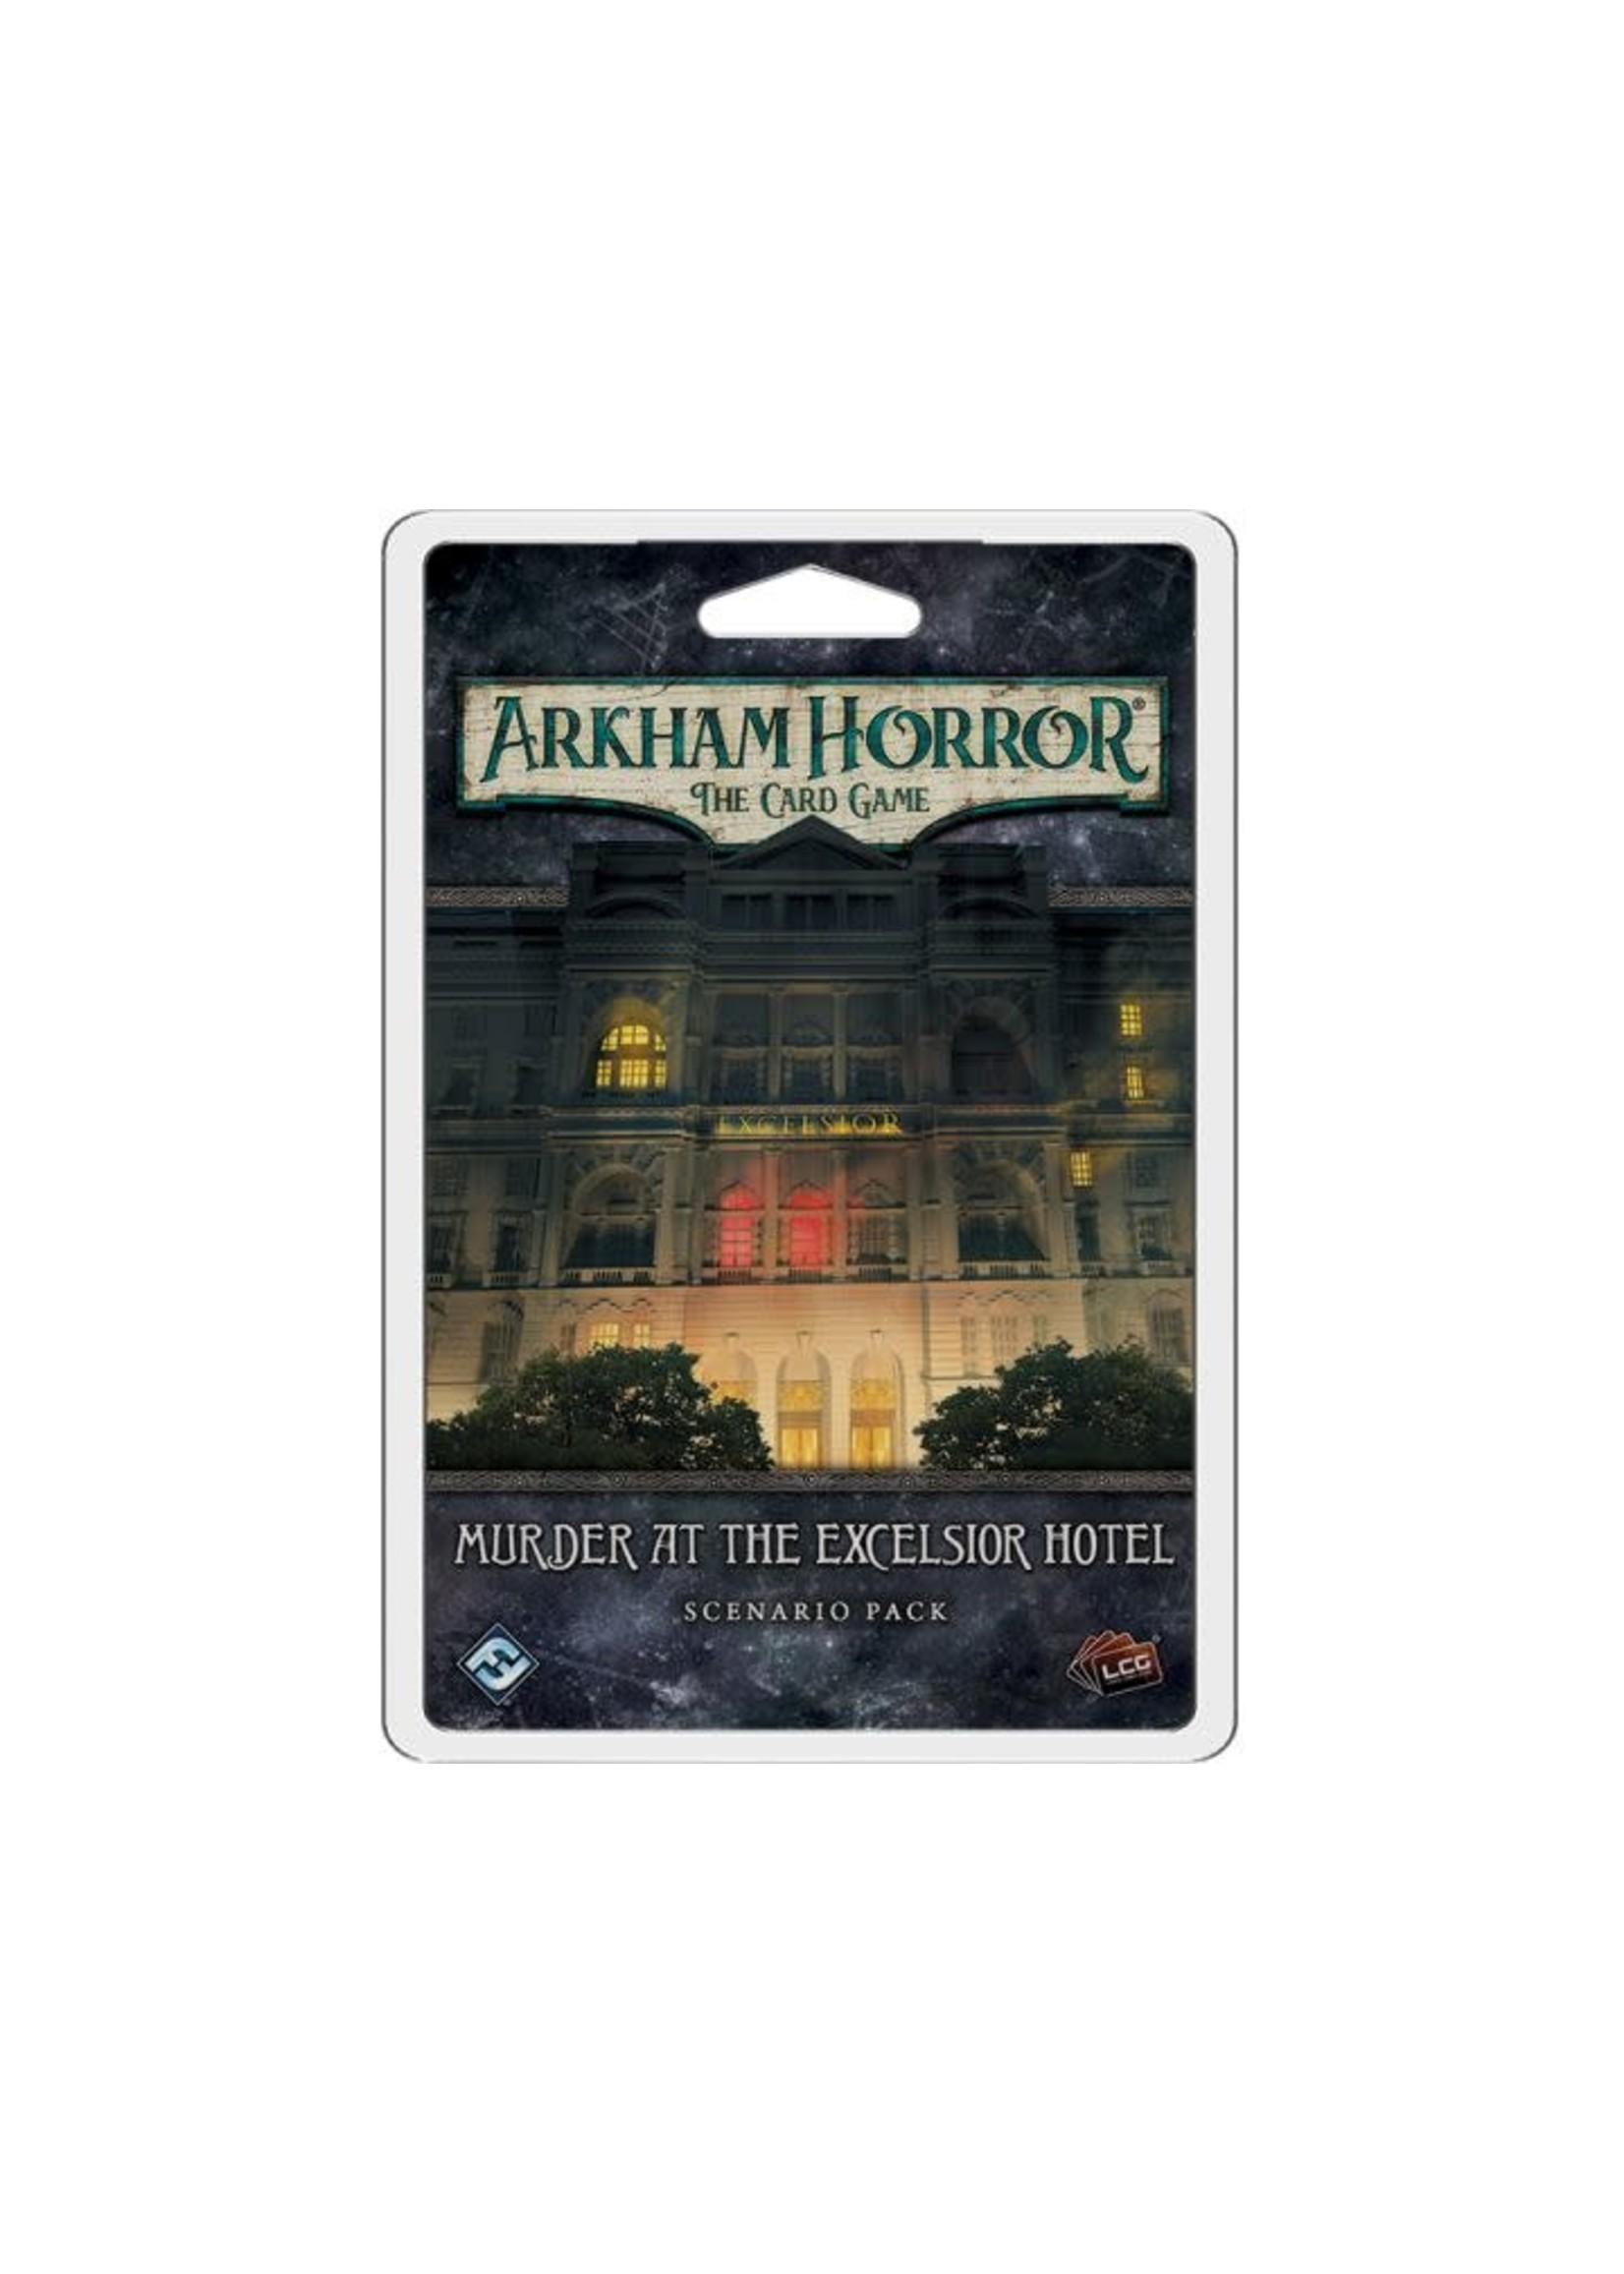 Arkham Horror Lcg: Murder At The Excelsior